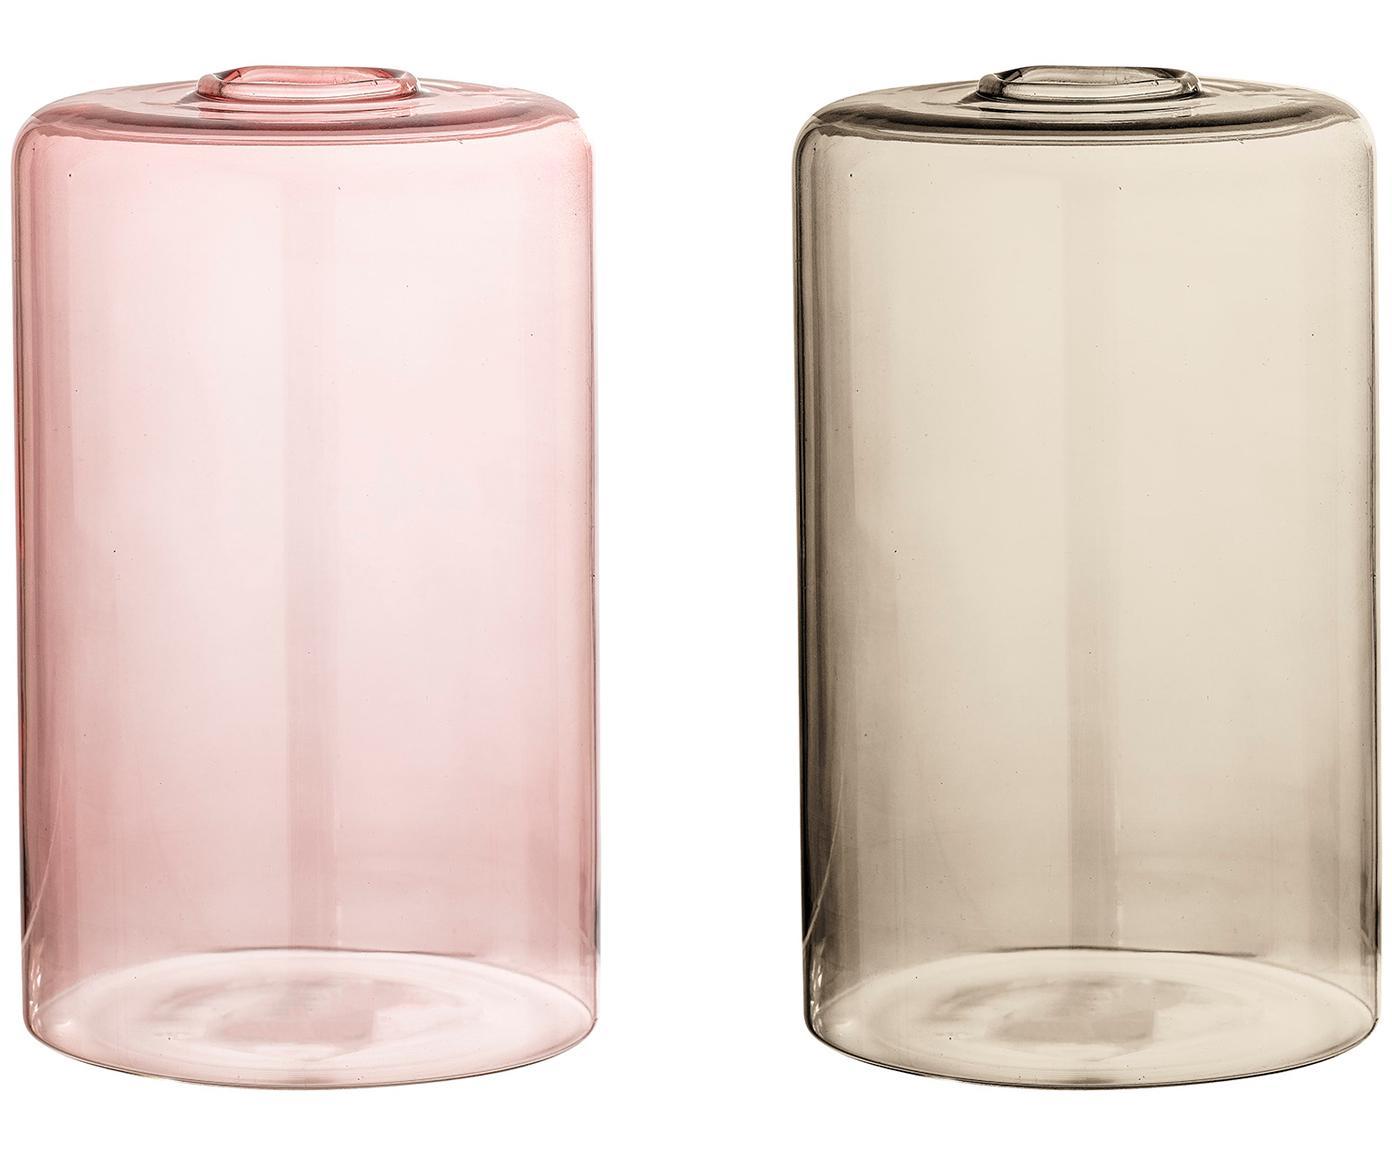 Set de jarrones de vidrio Uwe, 2pzas., Vidrio, Rosa, beige, Ø 10 x Al 16 cm